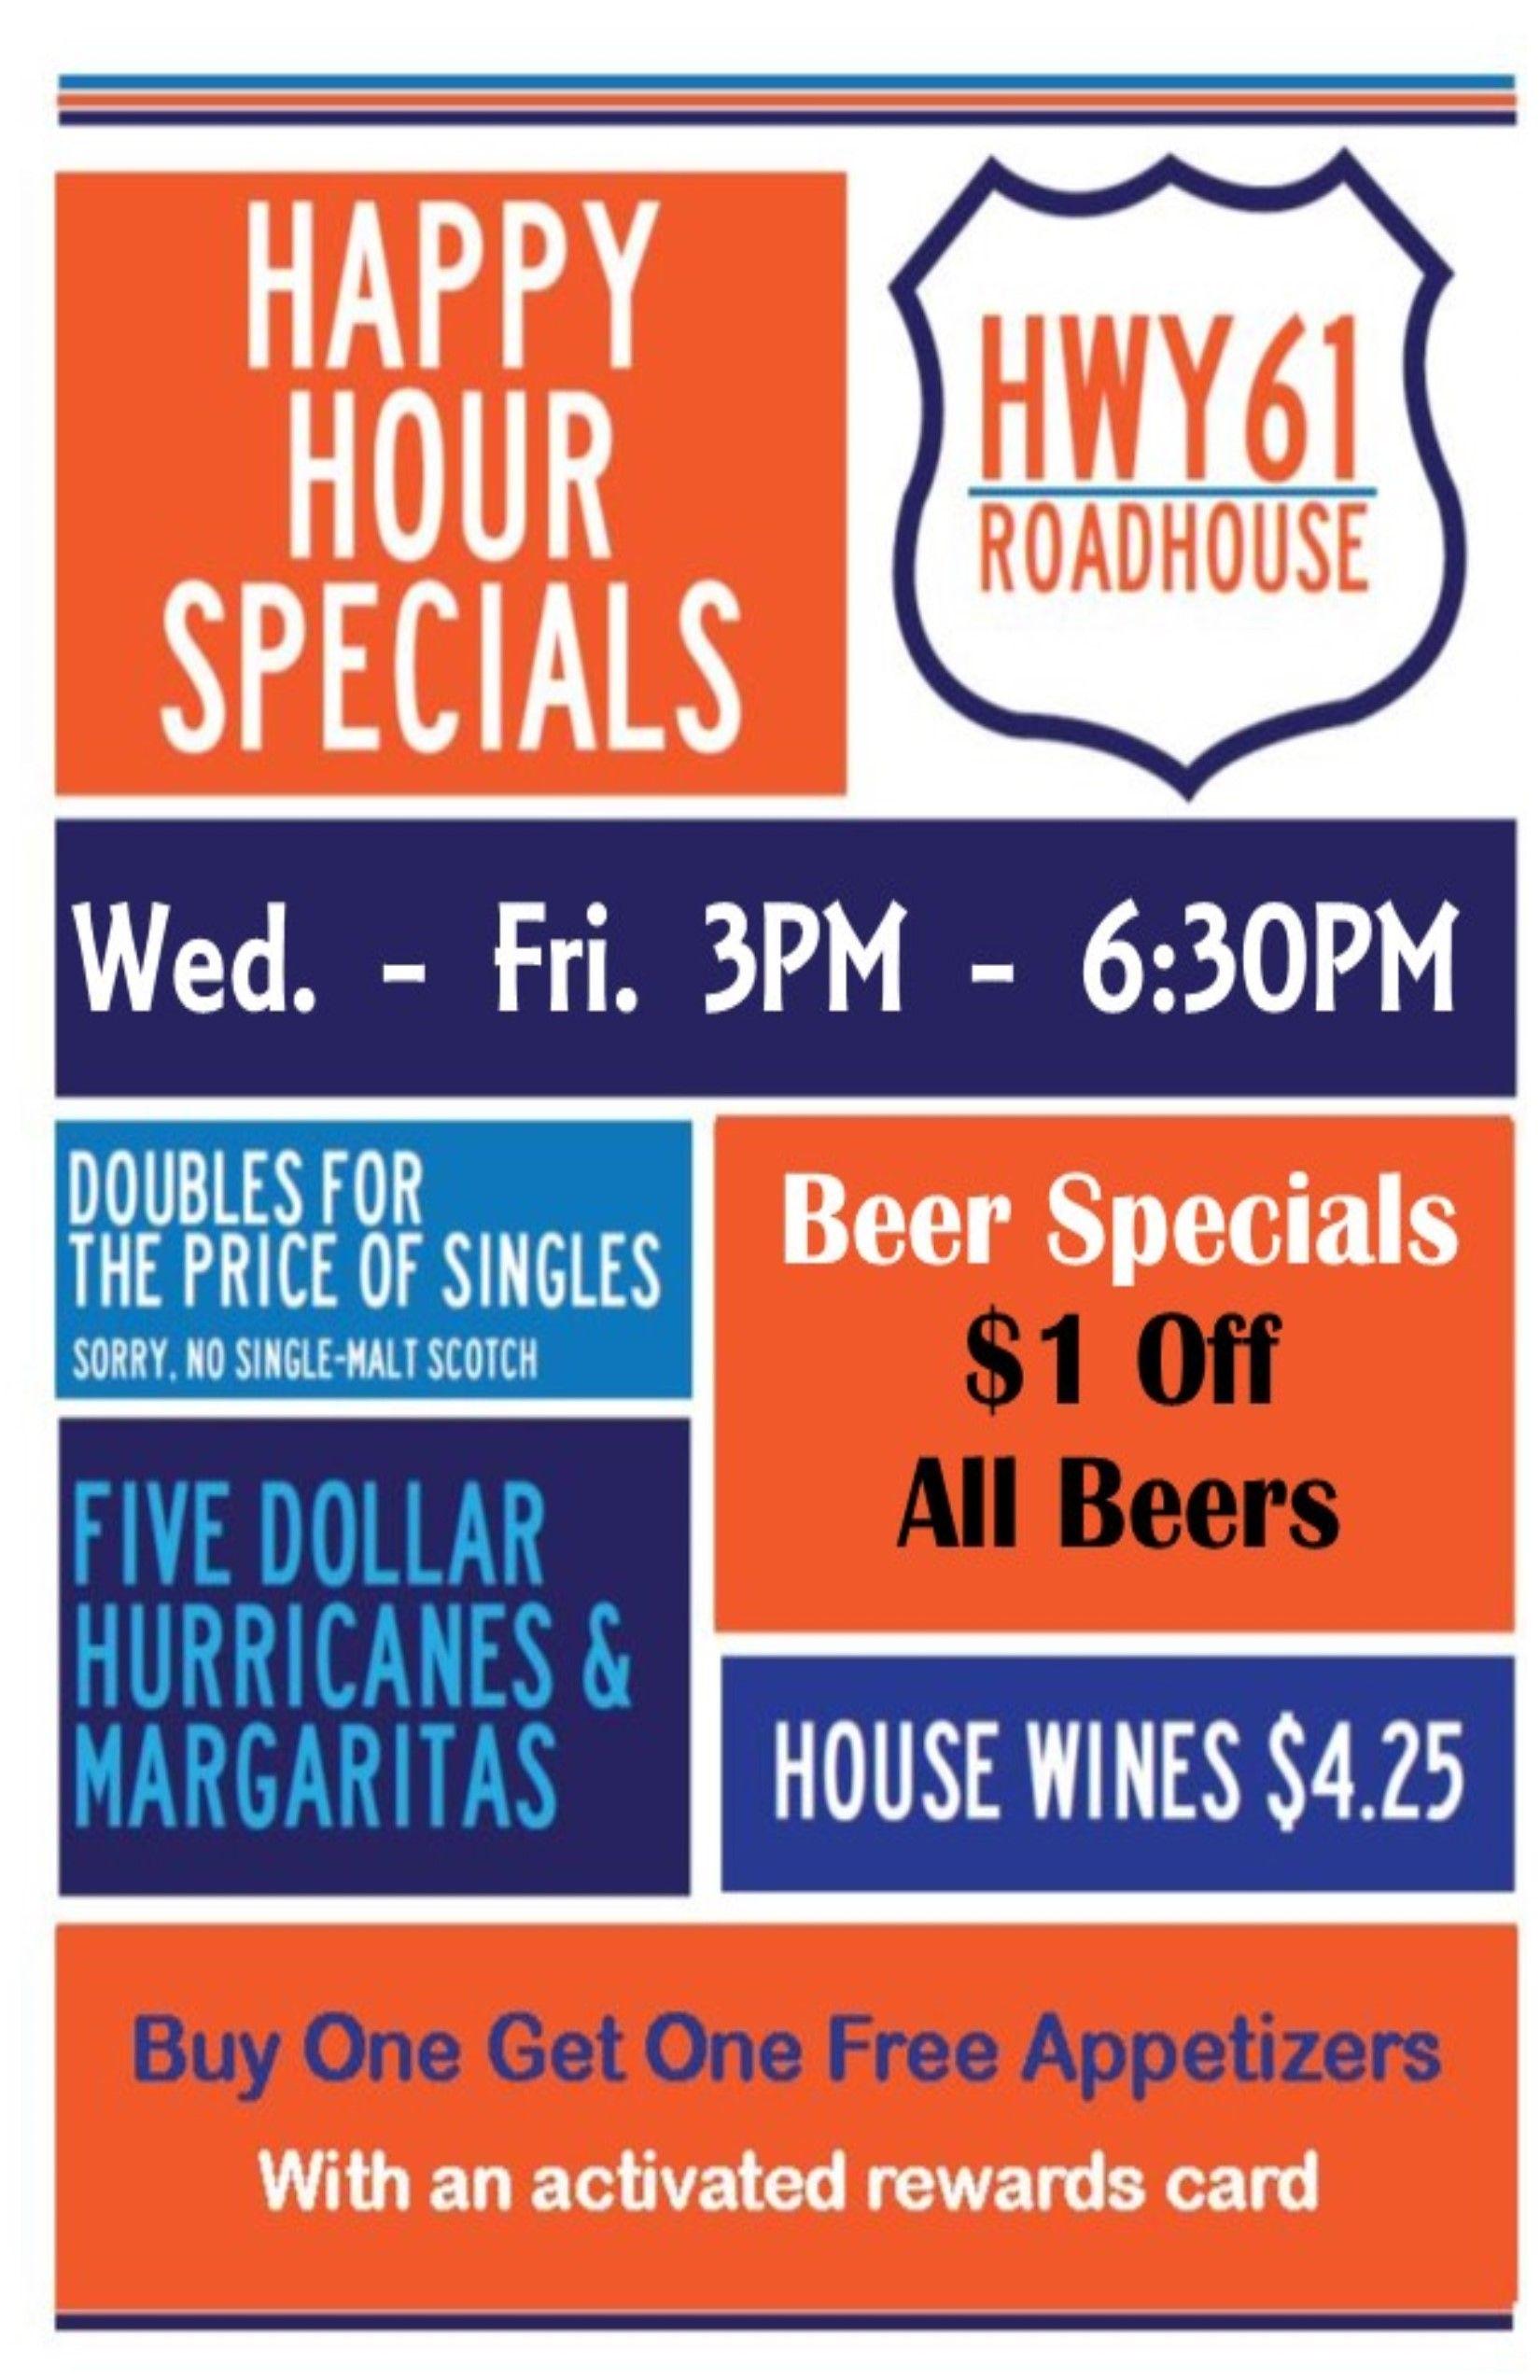 Happy hour wedfri 3630pm beer specials reward card beer